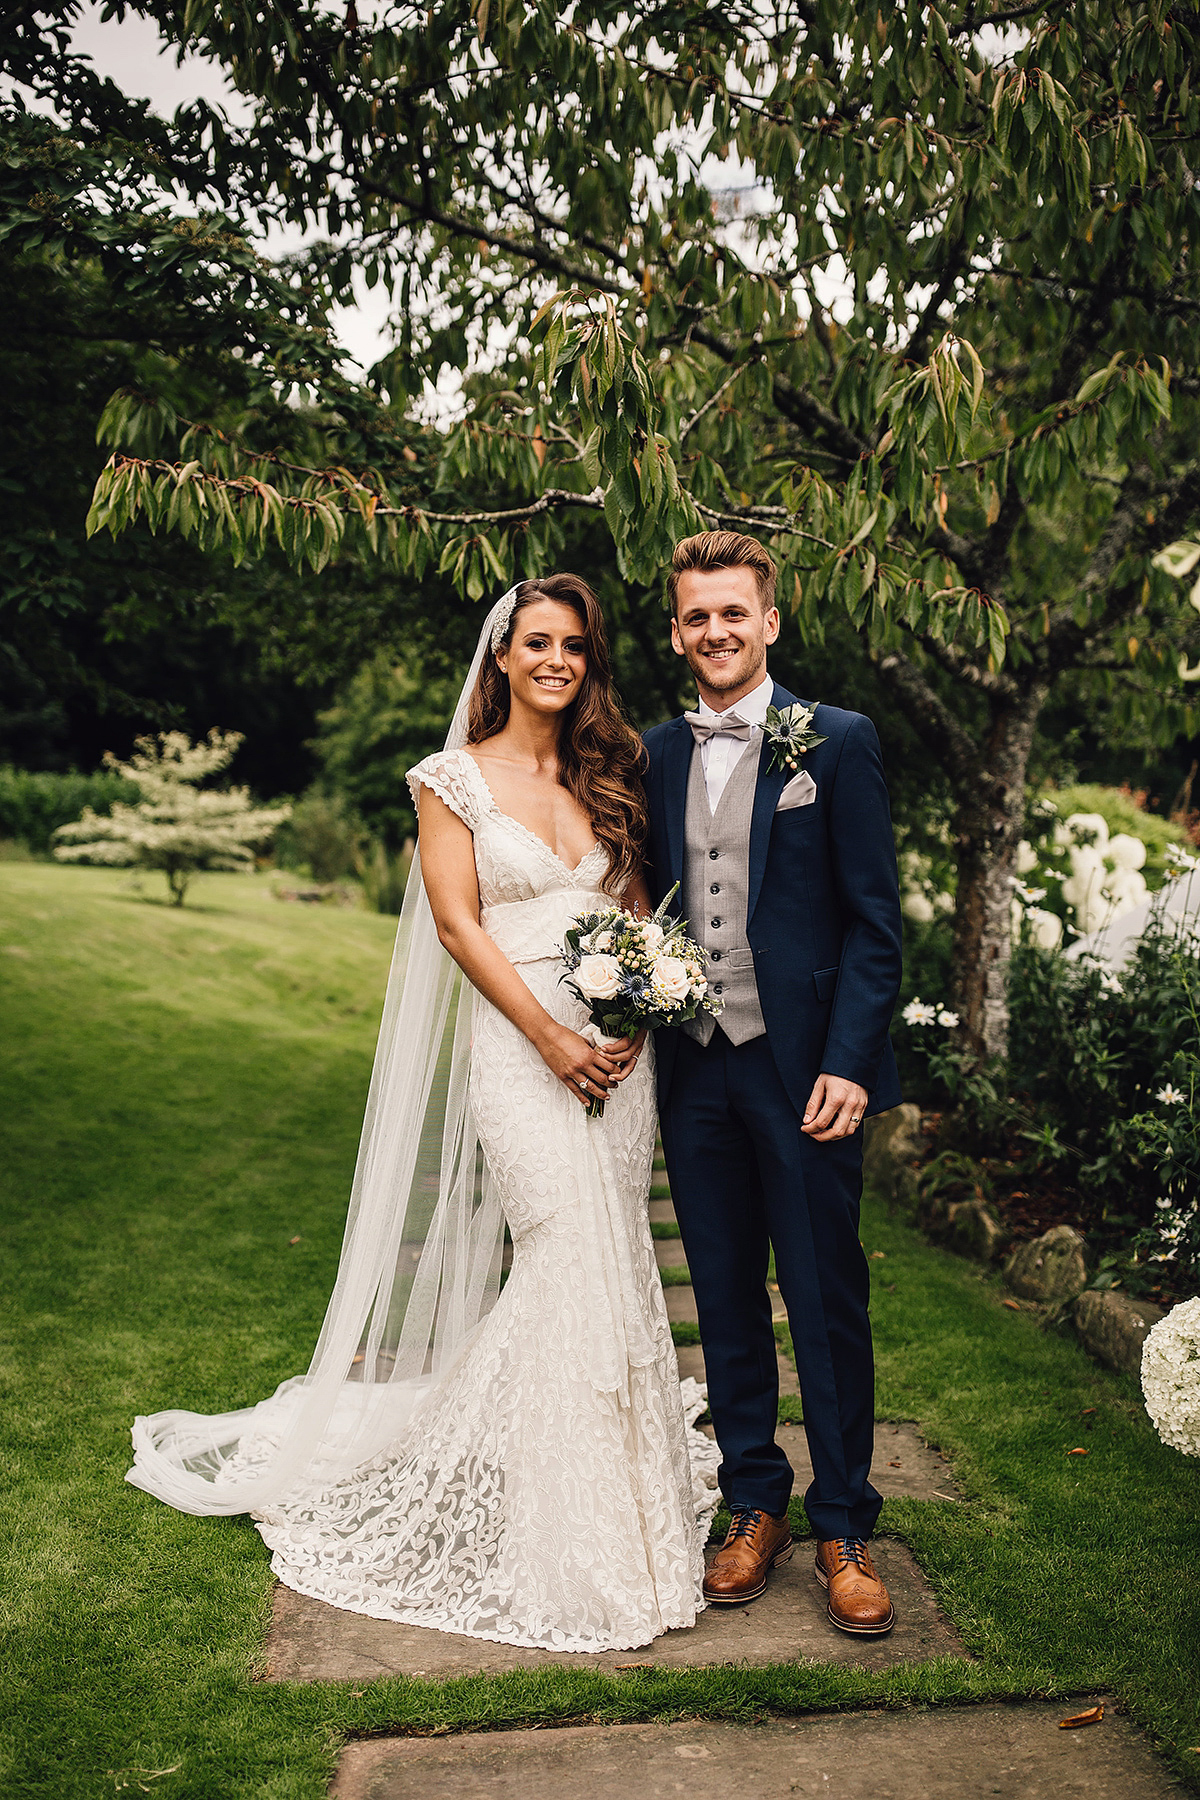 gavin and stacey wedding dress Wedding Ideas